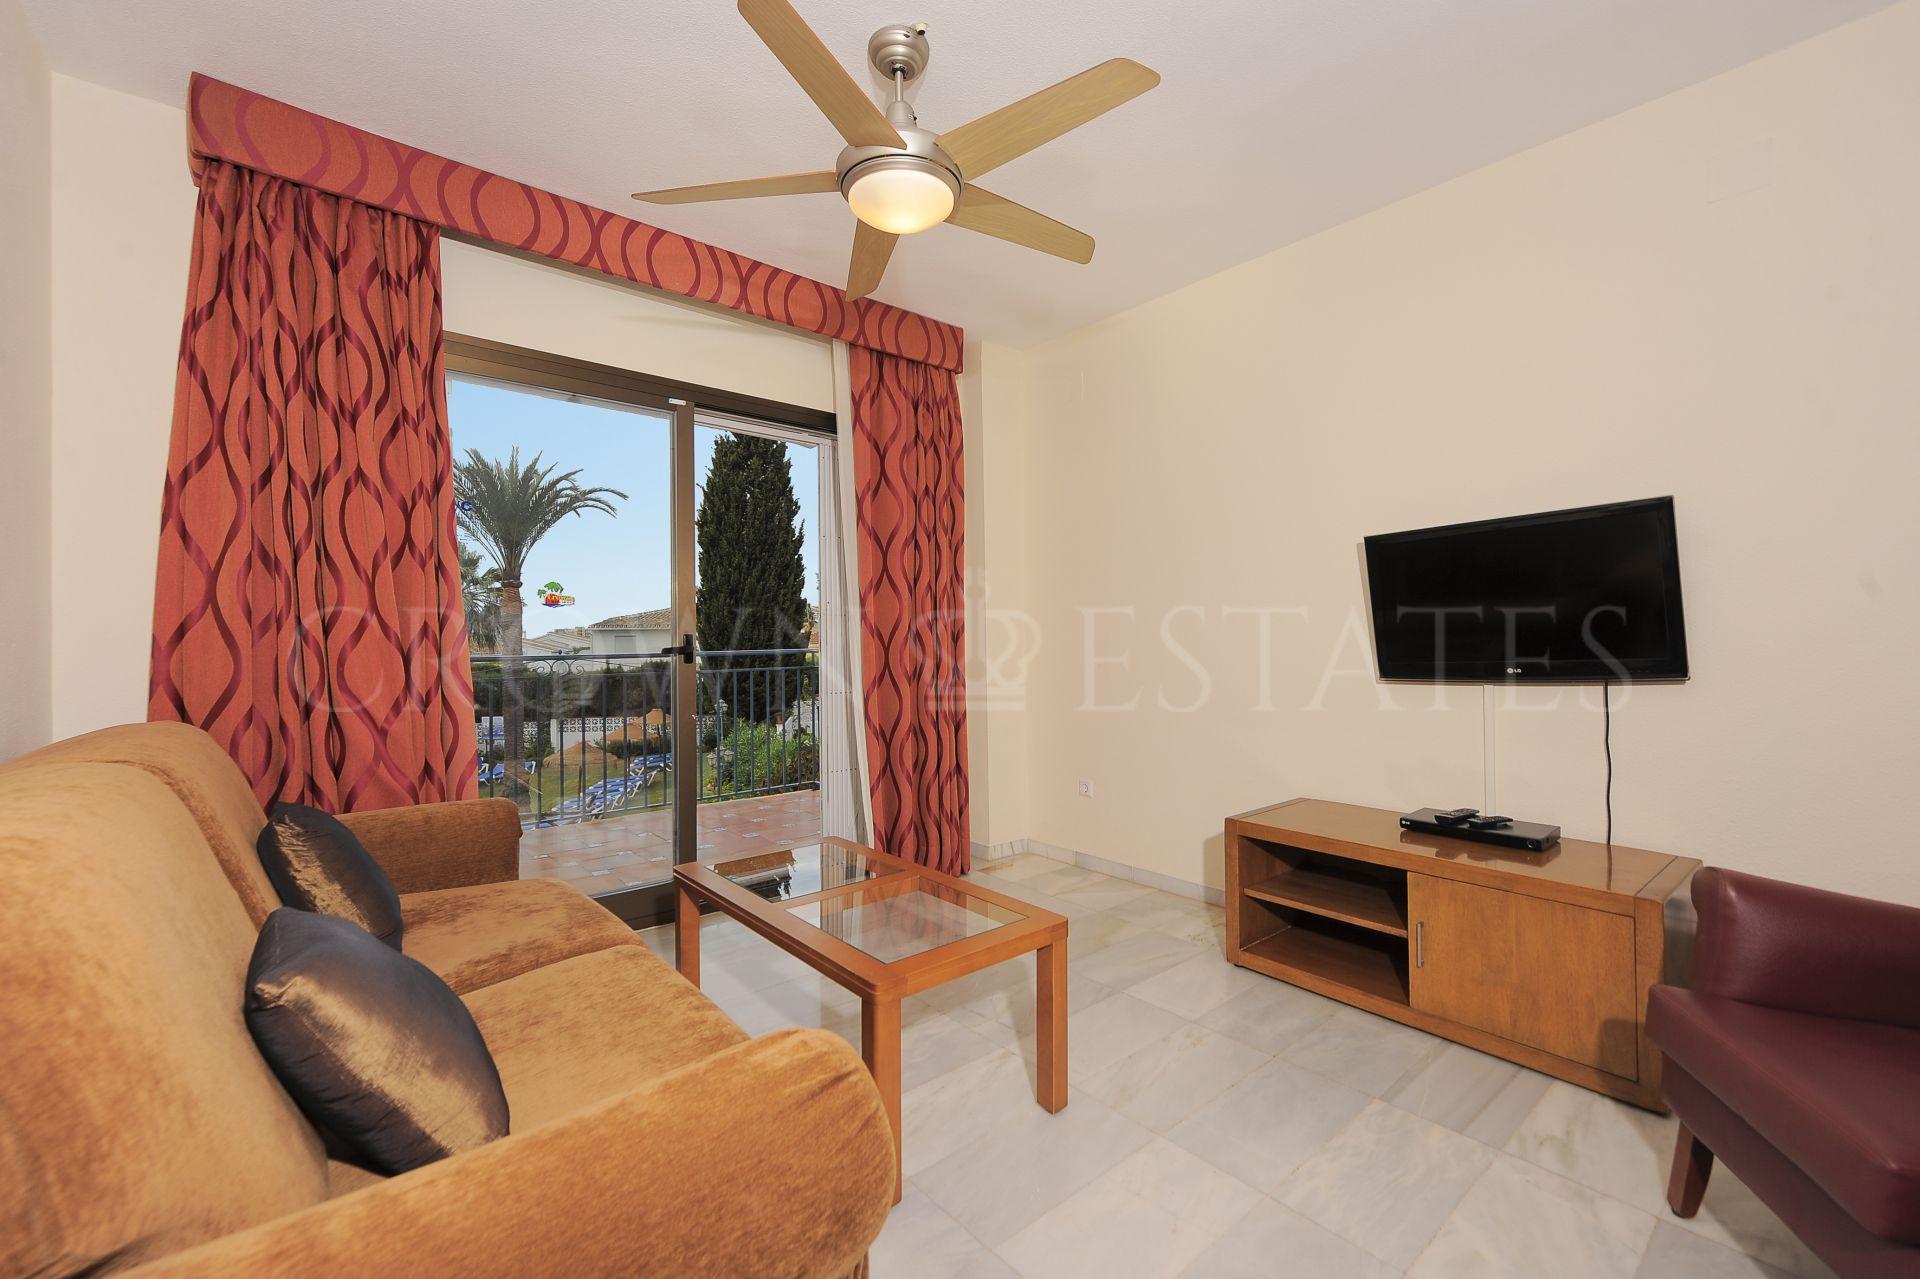 La Perla de Riviera, key-ready and fully furnished apartments in Mijas Costa